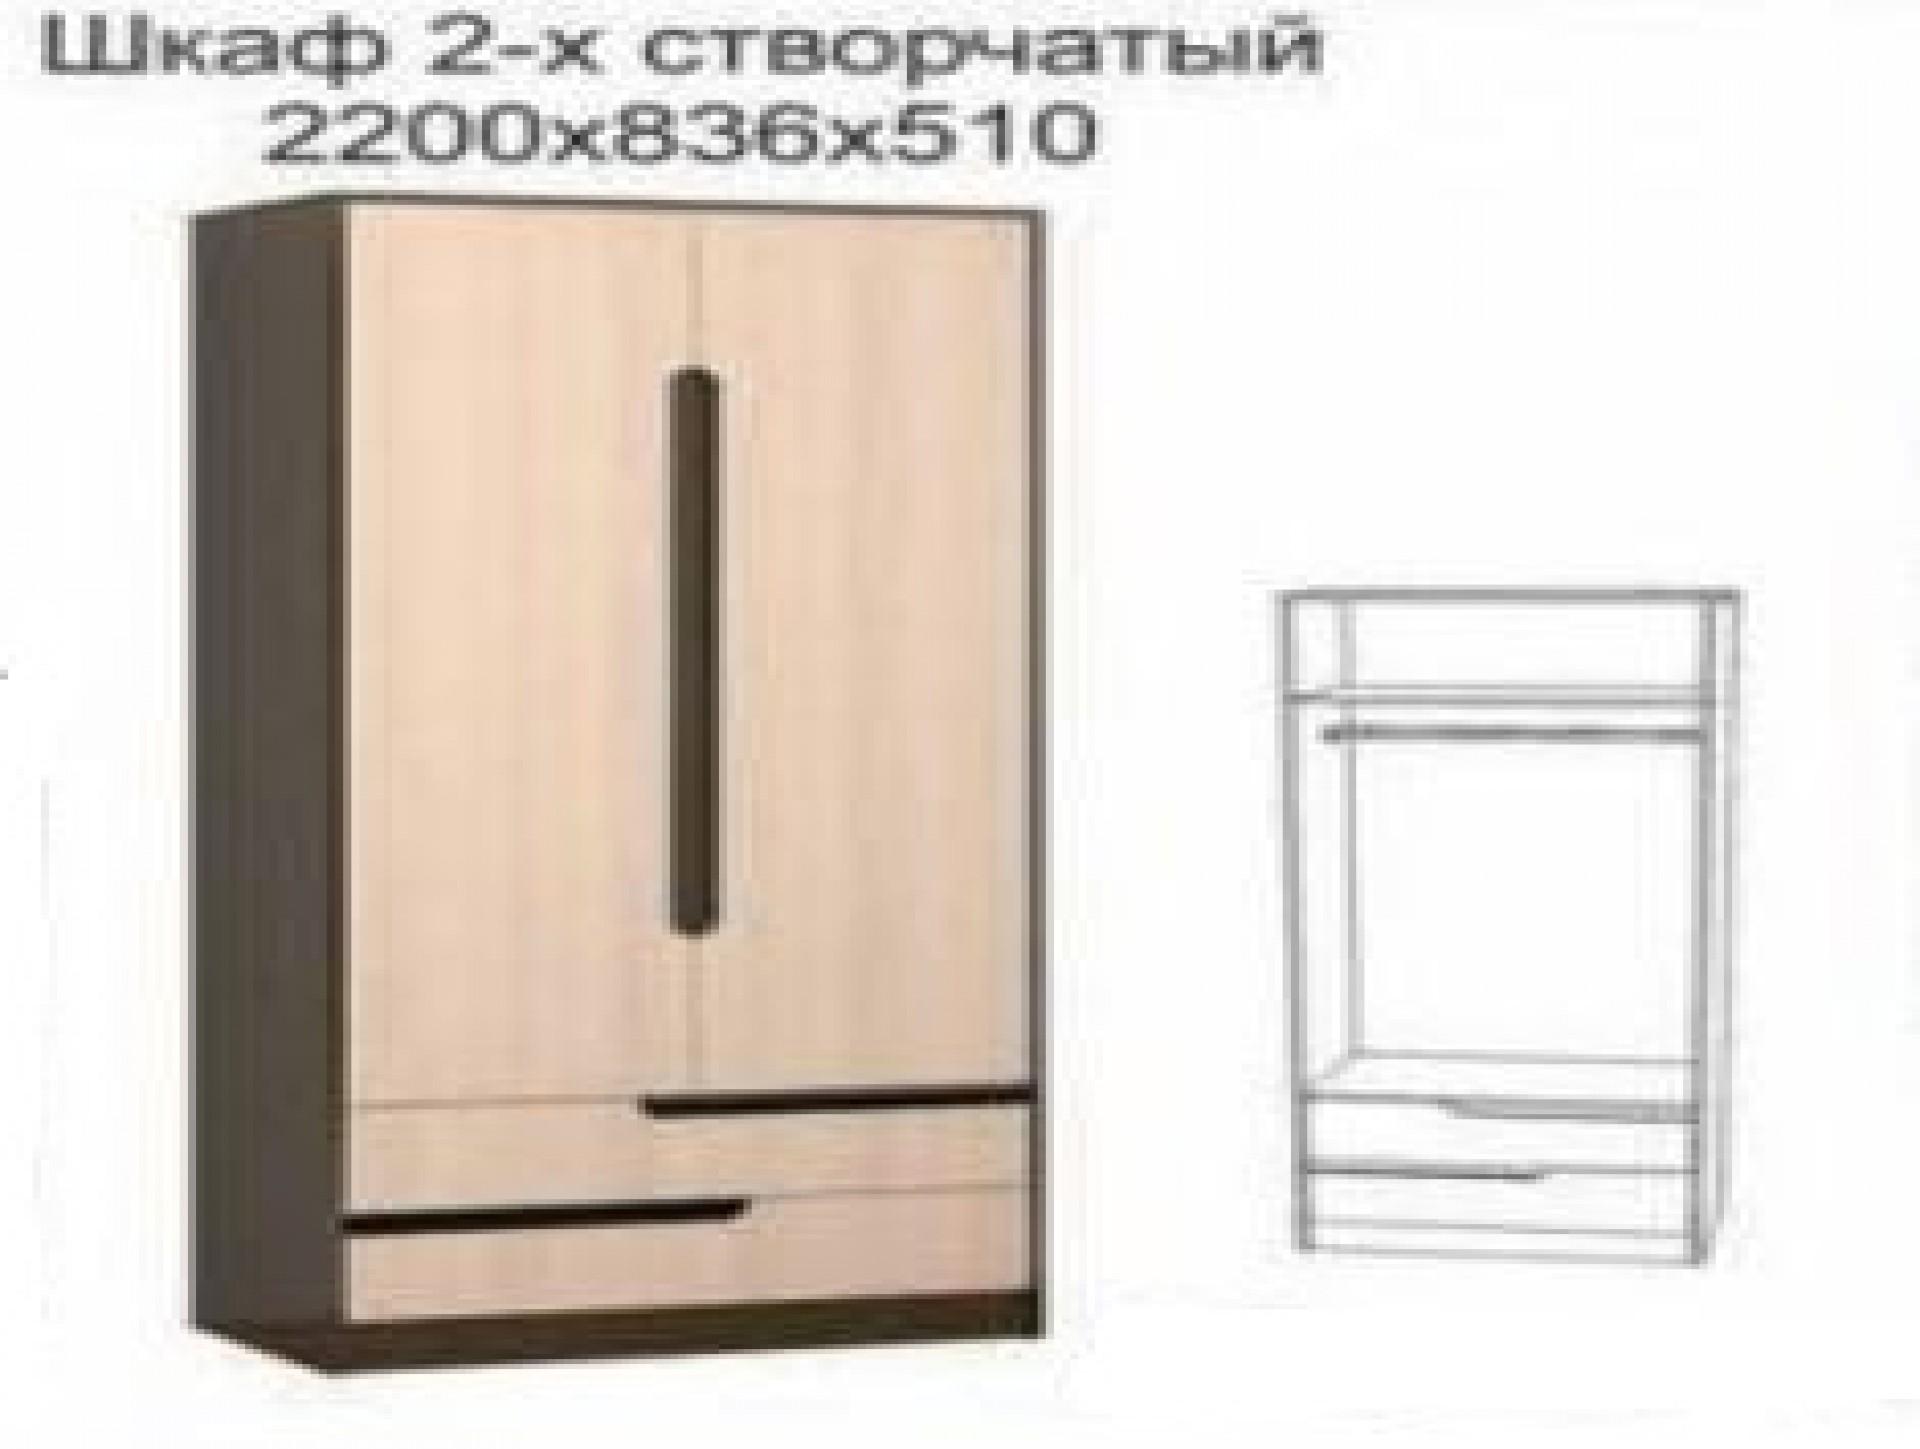 "Шкаф 2-створчатый ""Гавана"" приобрести в Томске"